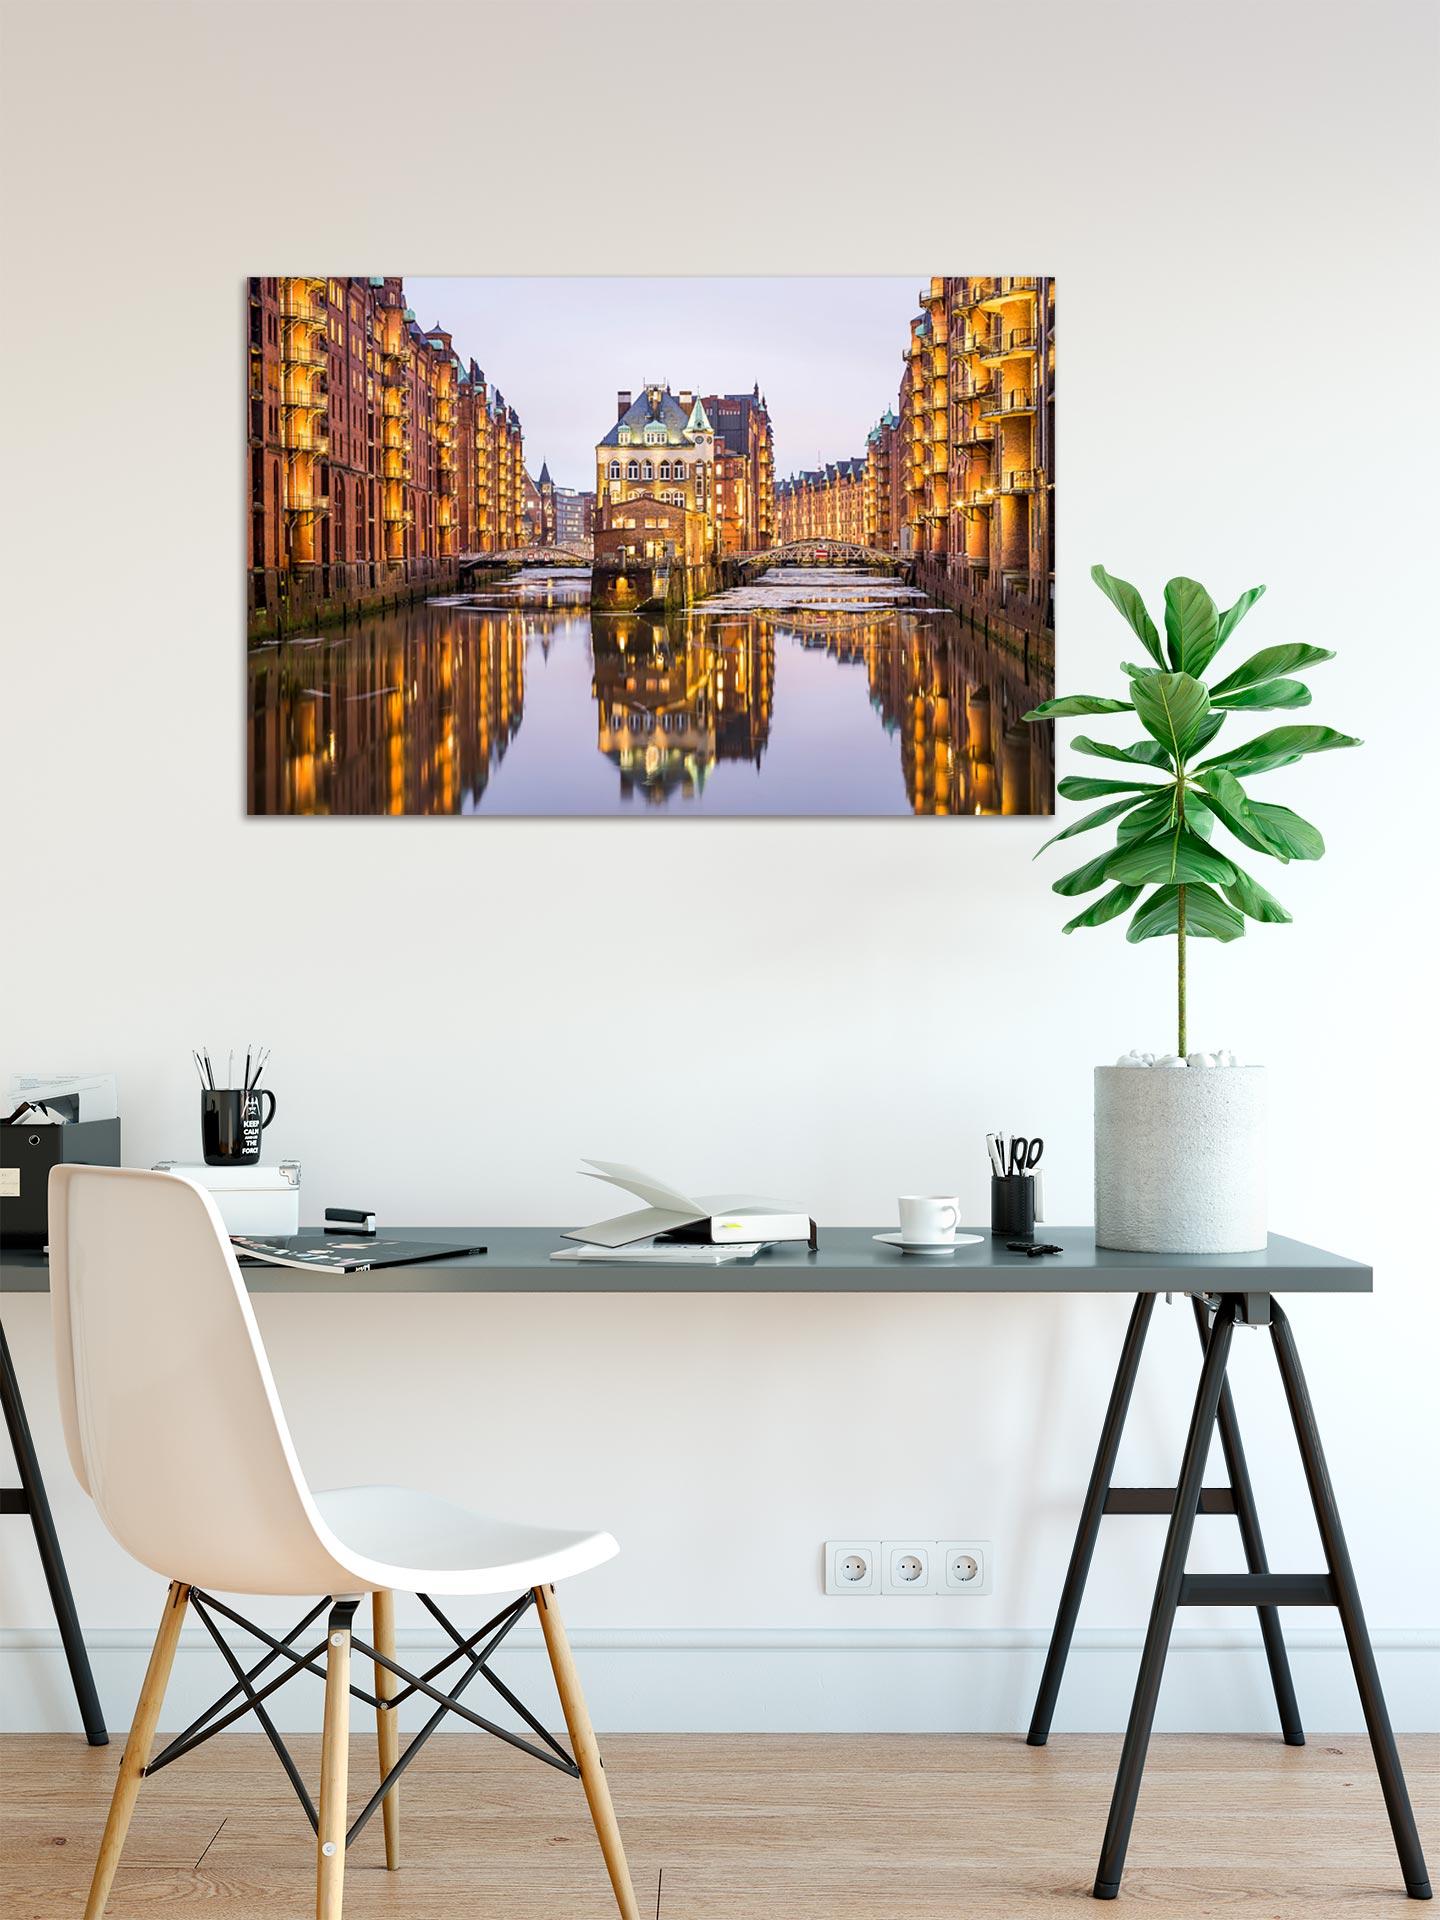 JS028-speicherstadt-hamburg-wandbild-bild-auf-leinwand-acrylglas-aludibond-arbeitszimmer